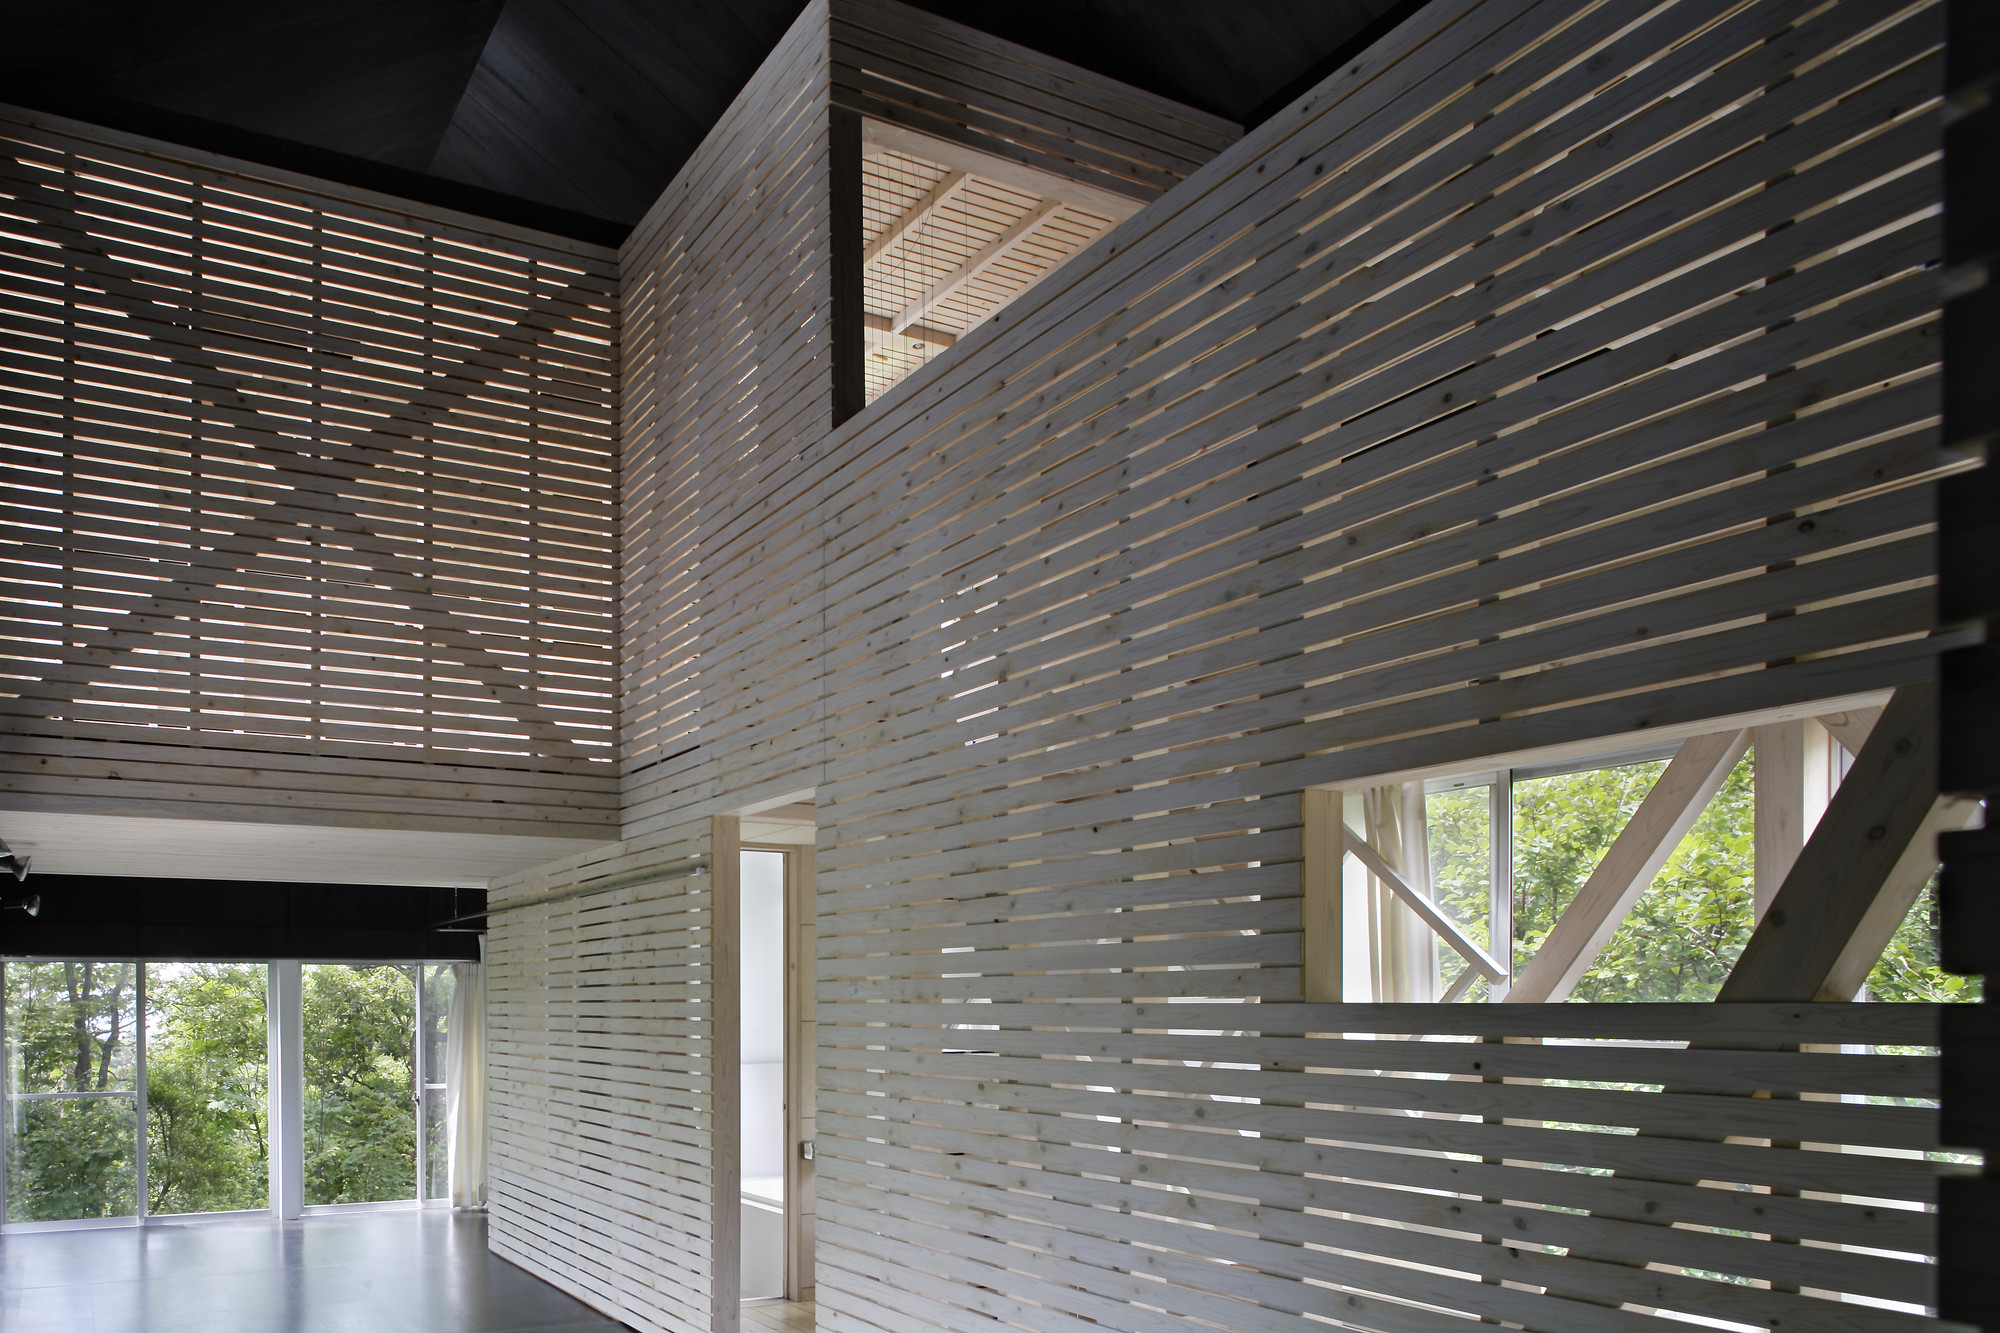 Cottage in Tsumari /  Daigo Ishii + Future-scape Architects, © Koji Fujii